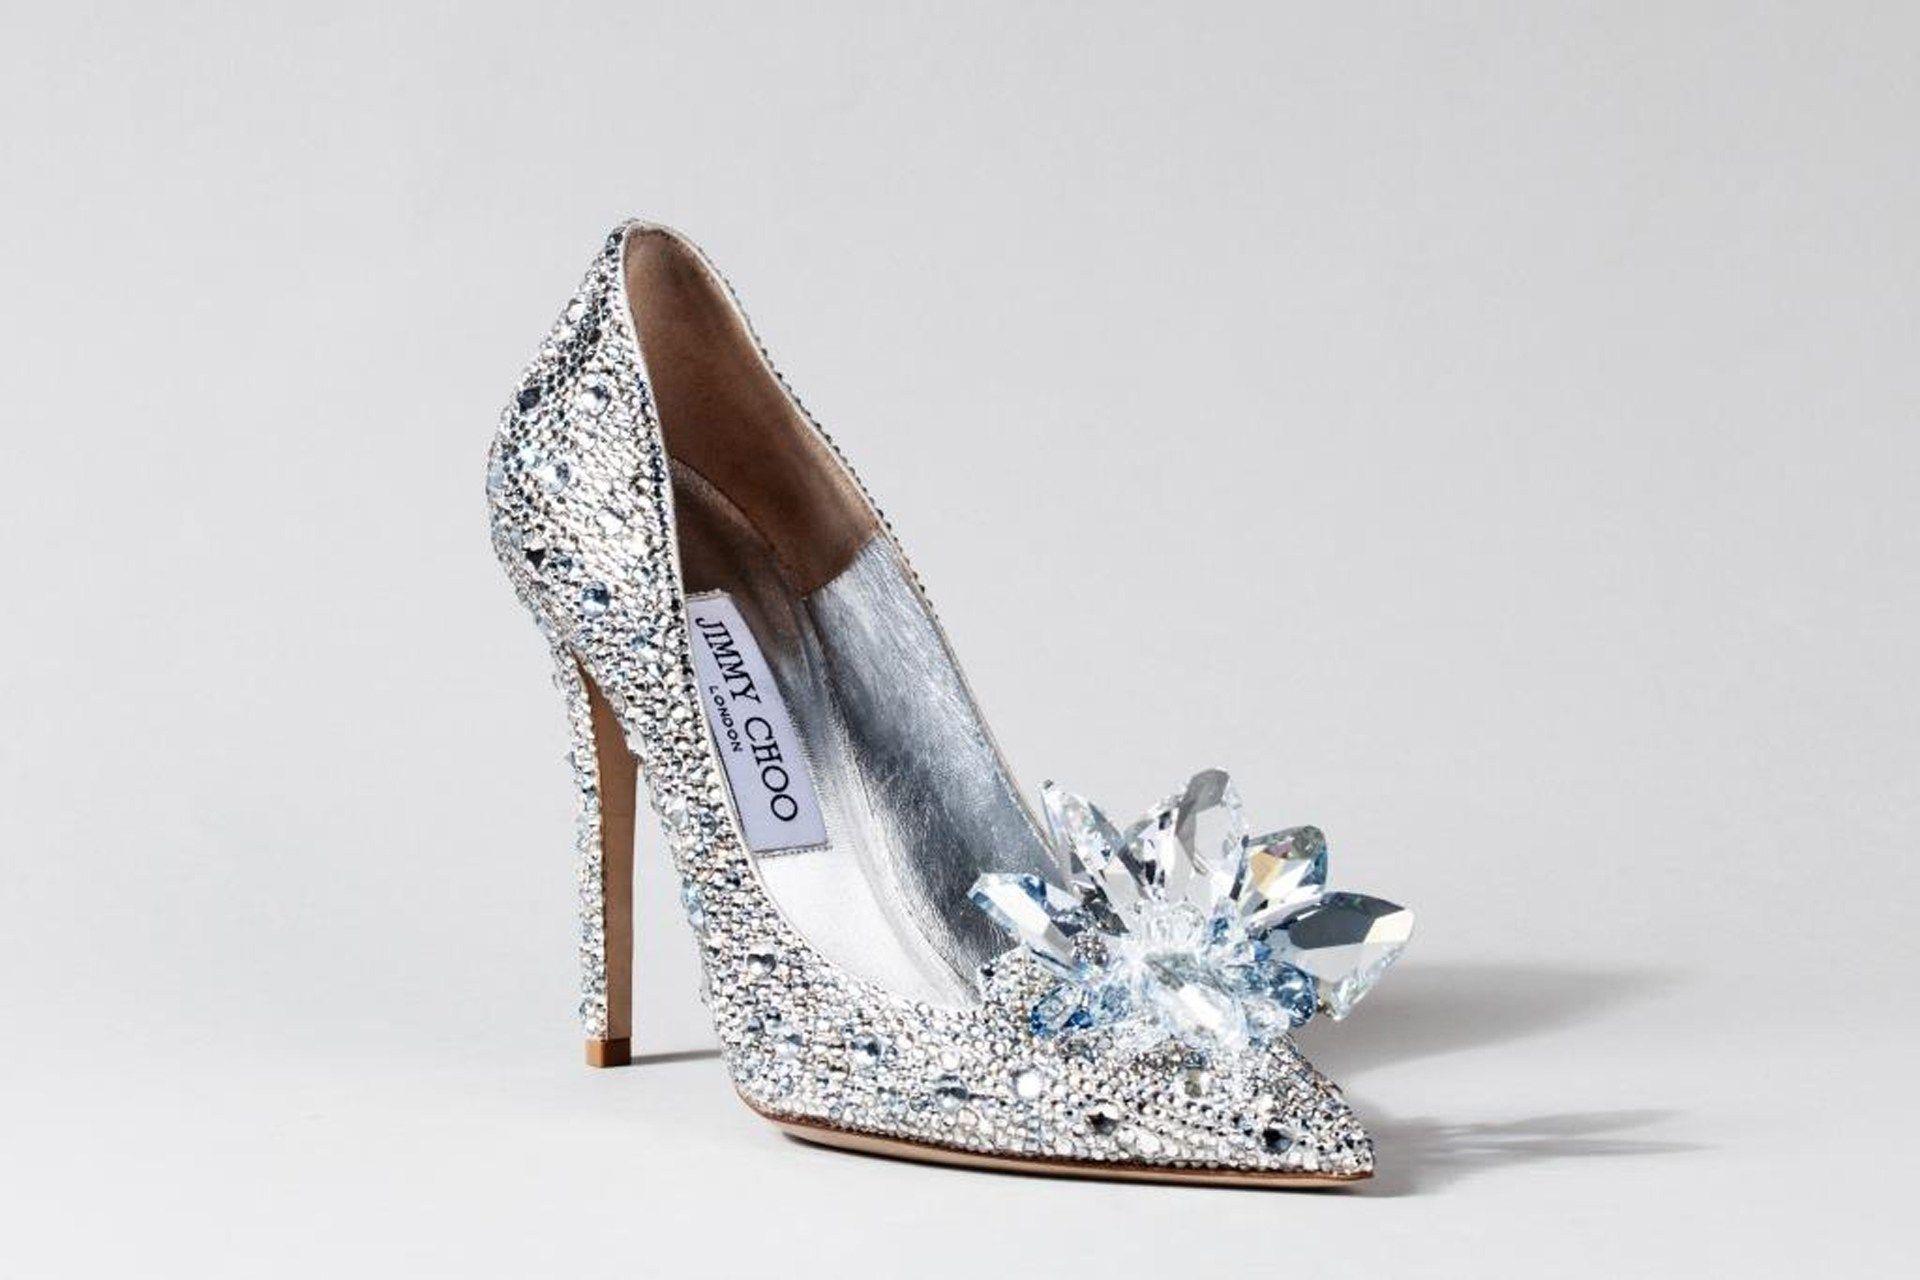 Crystal #Cinderella-inspired Jimmy Choo